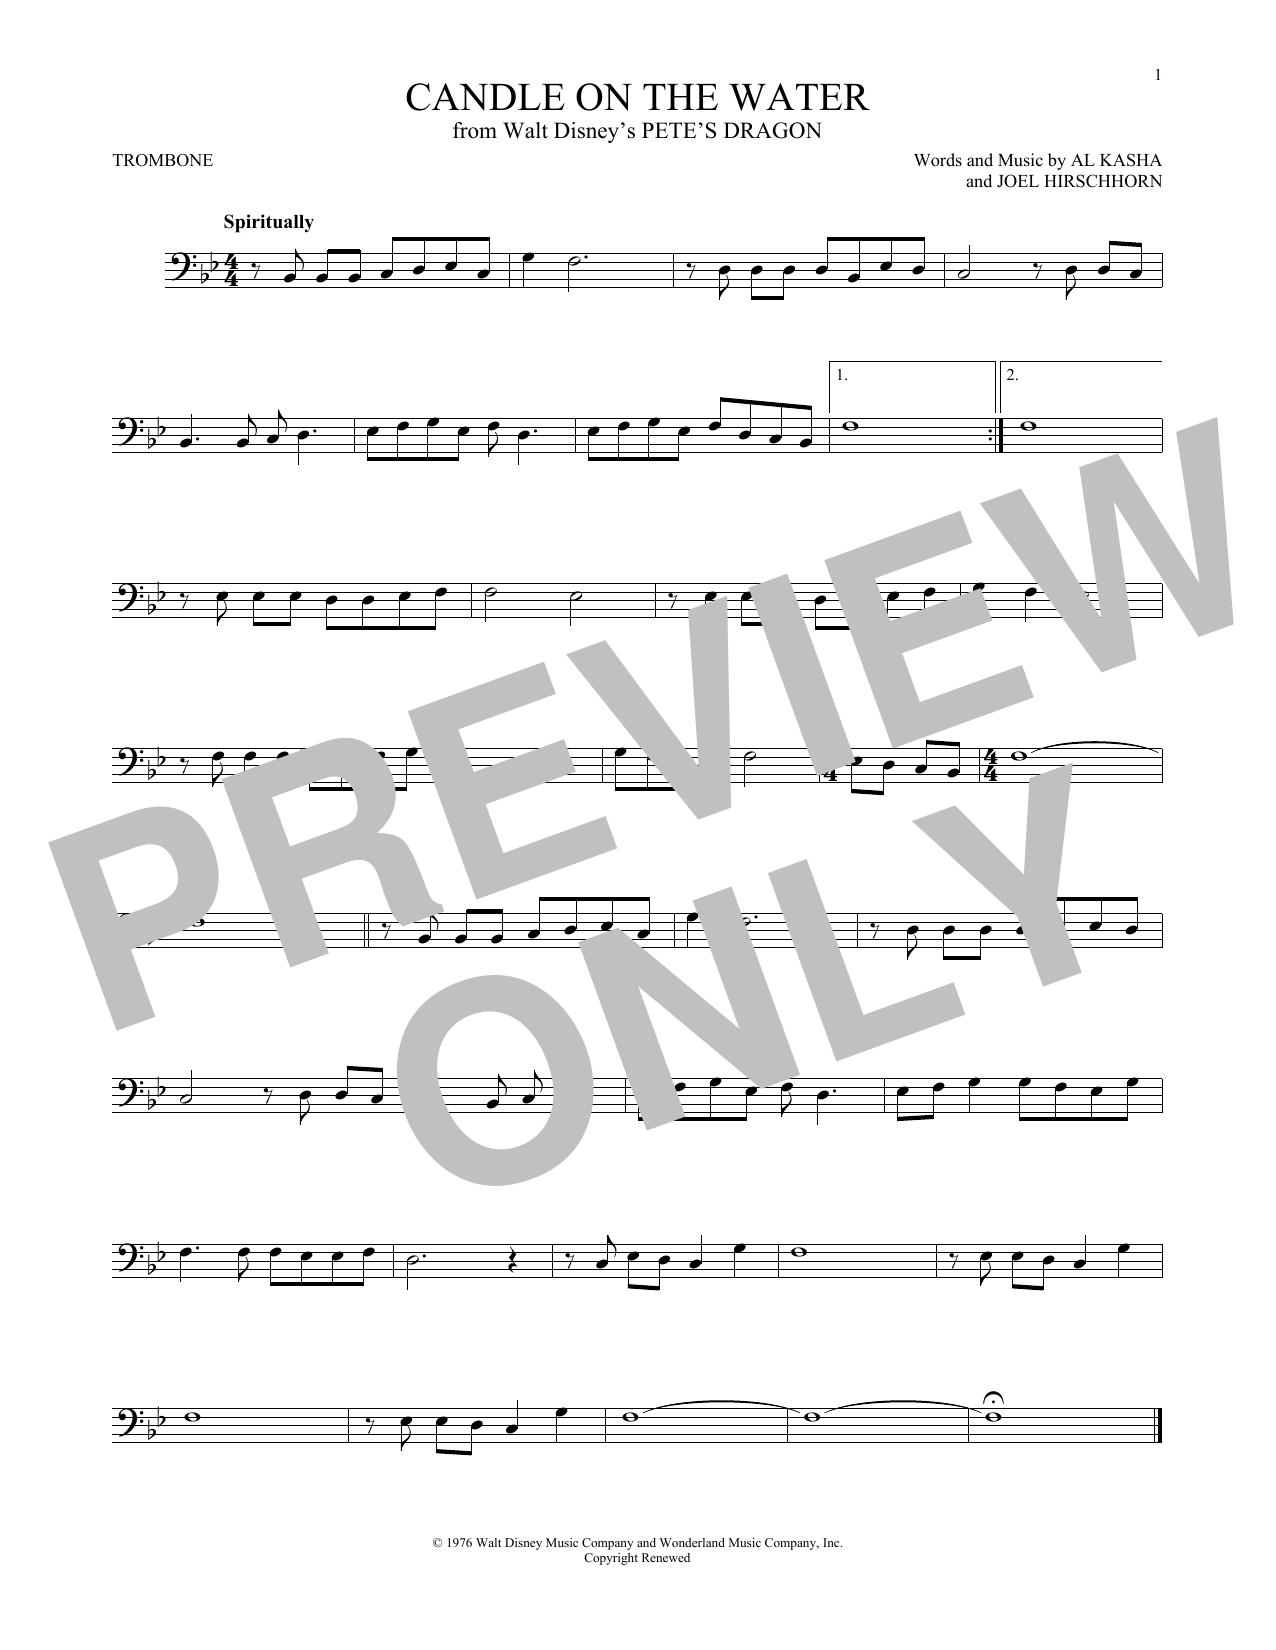 Partition autre Candle On The Water (from Walt Disney's Pete's Dragon) de Kasha & Hirschhorn - Trombone